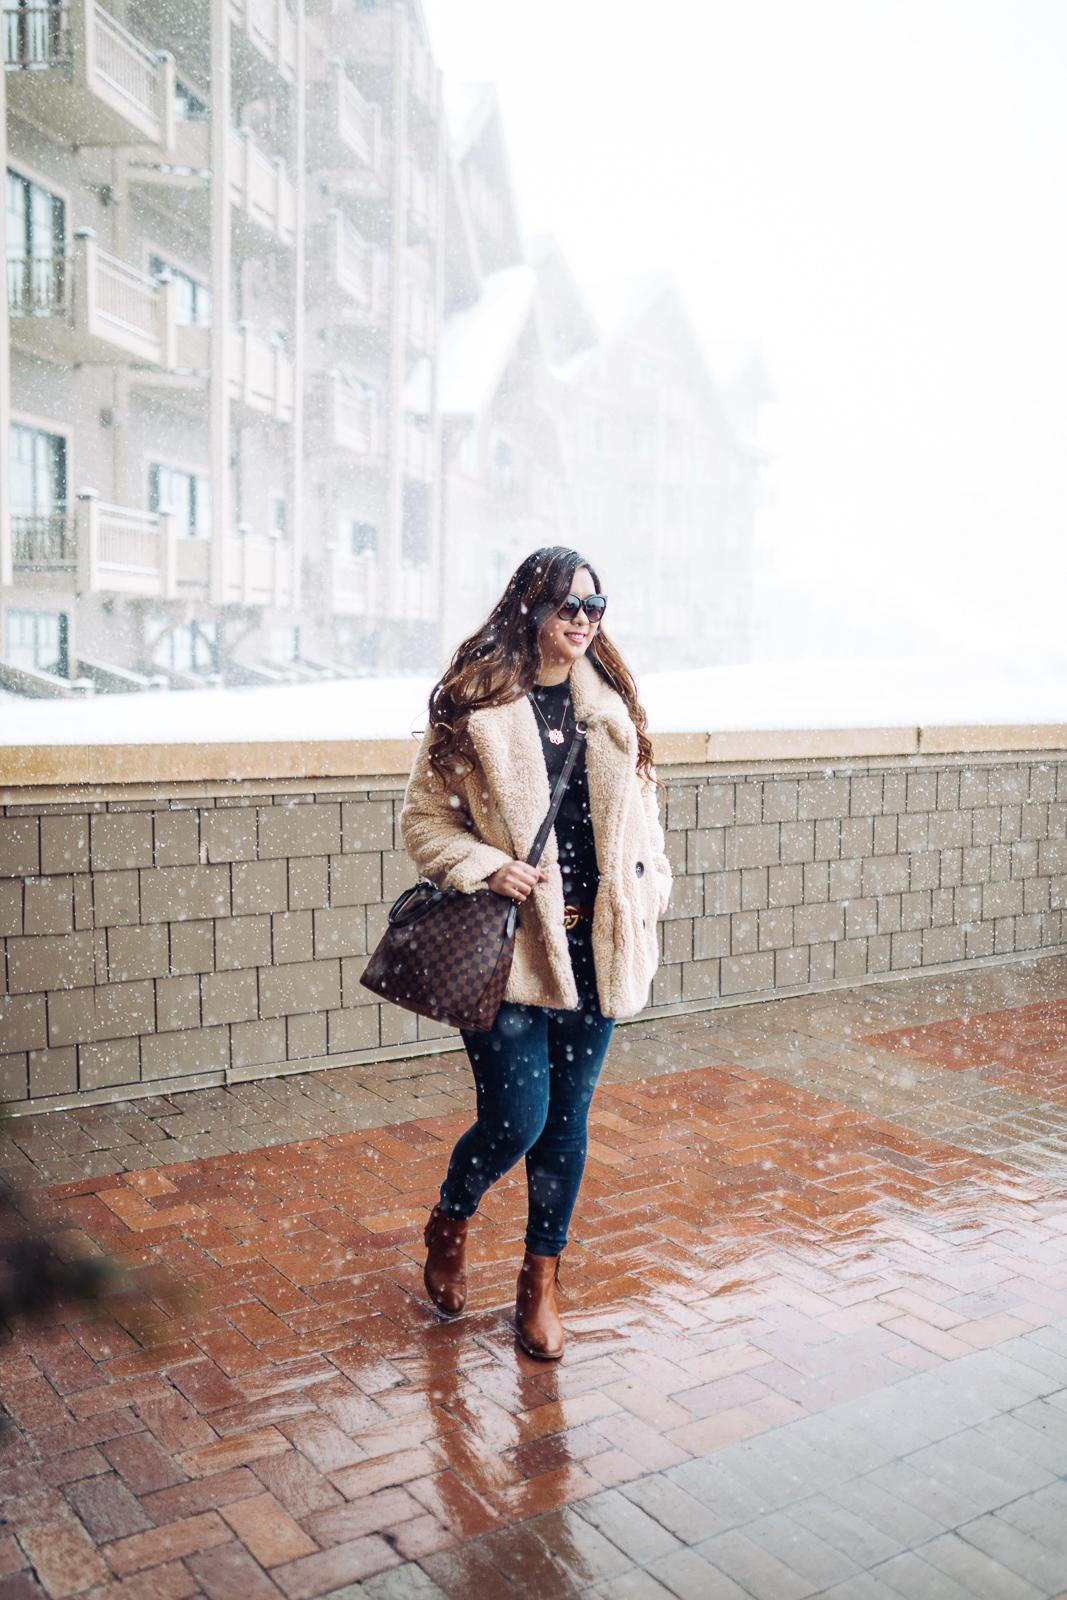 Best Faux Fur Coats for Winter by popular Utah fashion blogger Sandy A La Mode